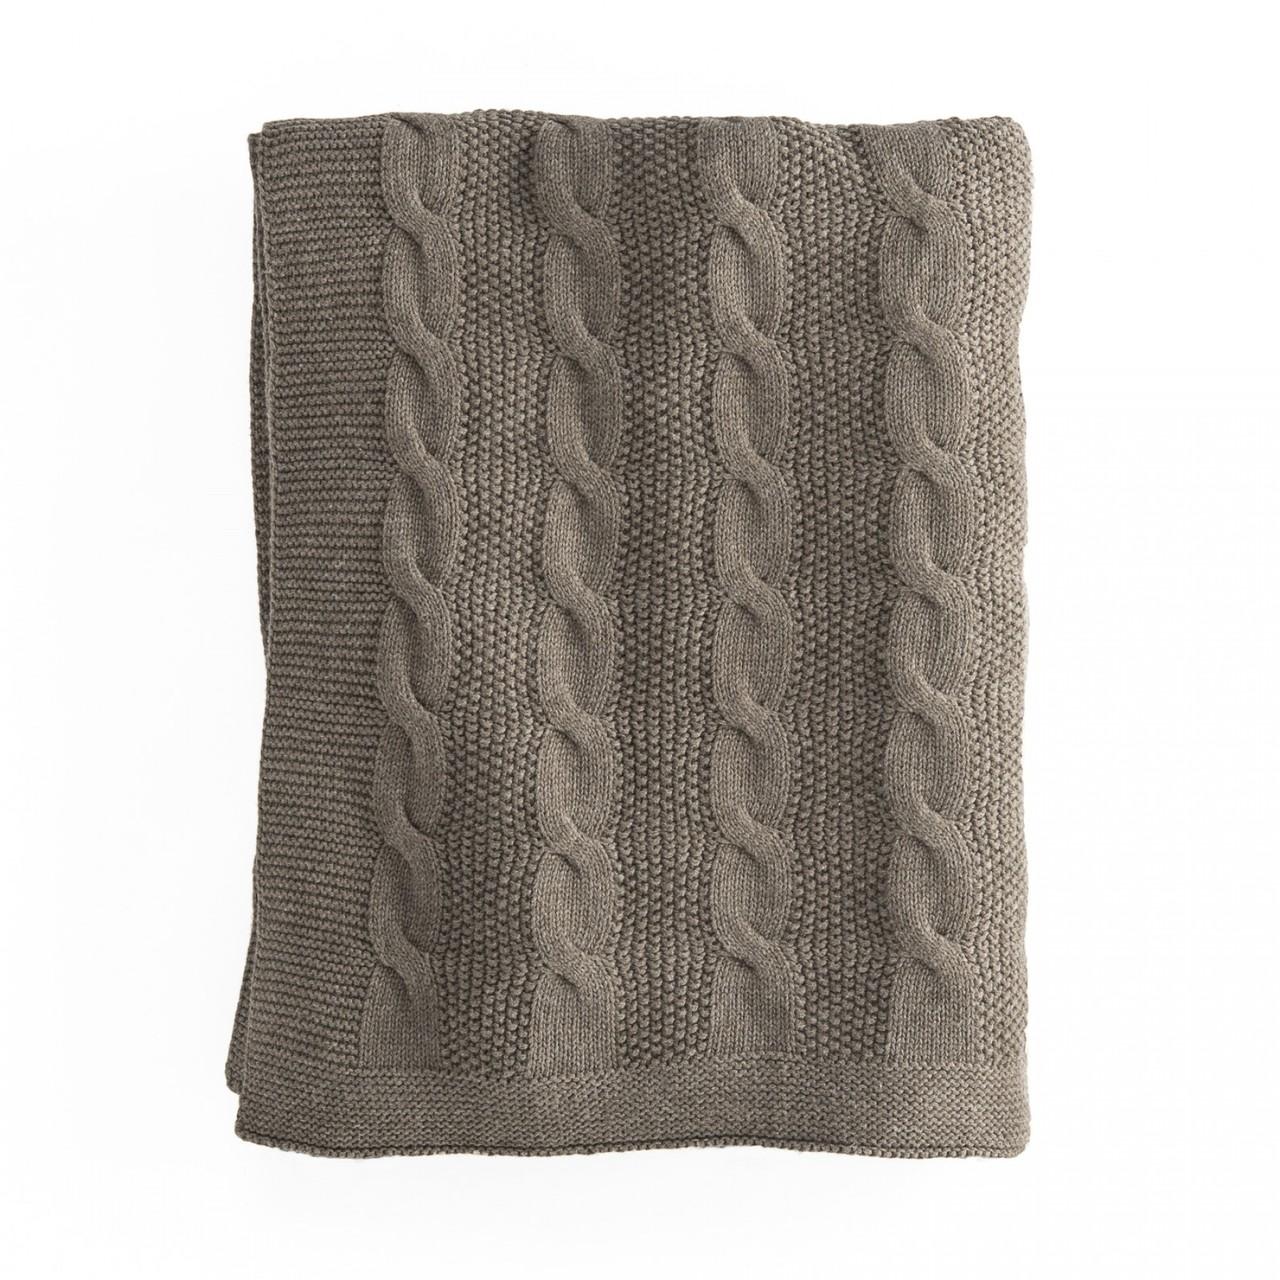 In2Linen Orlando 100% Cotton Cable Knit Throw | Brown/Mocha